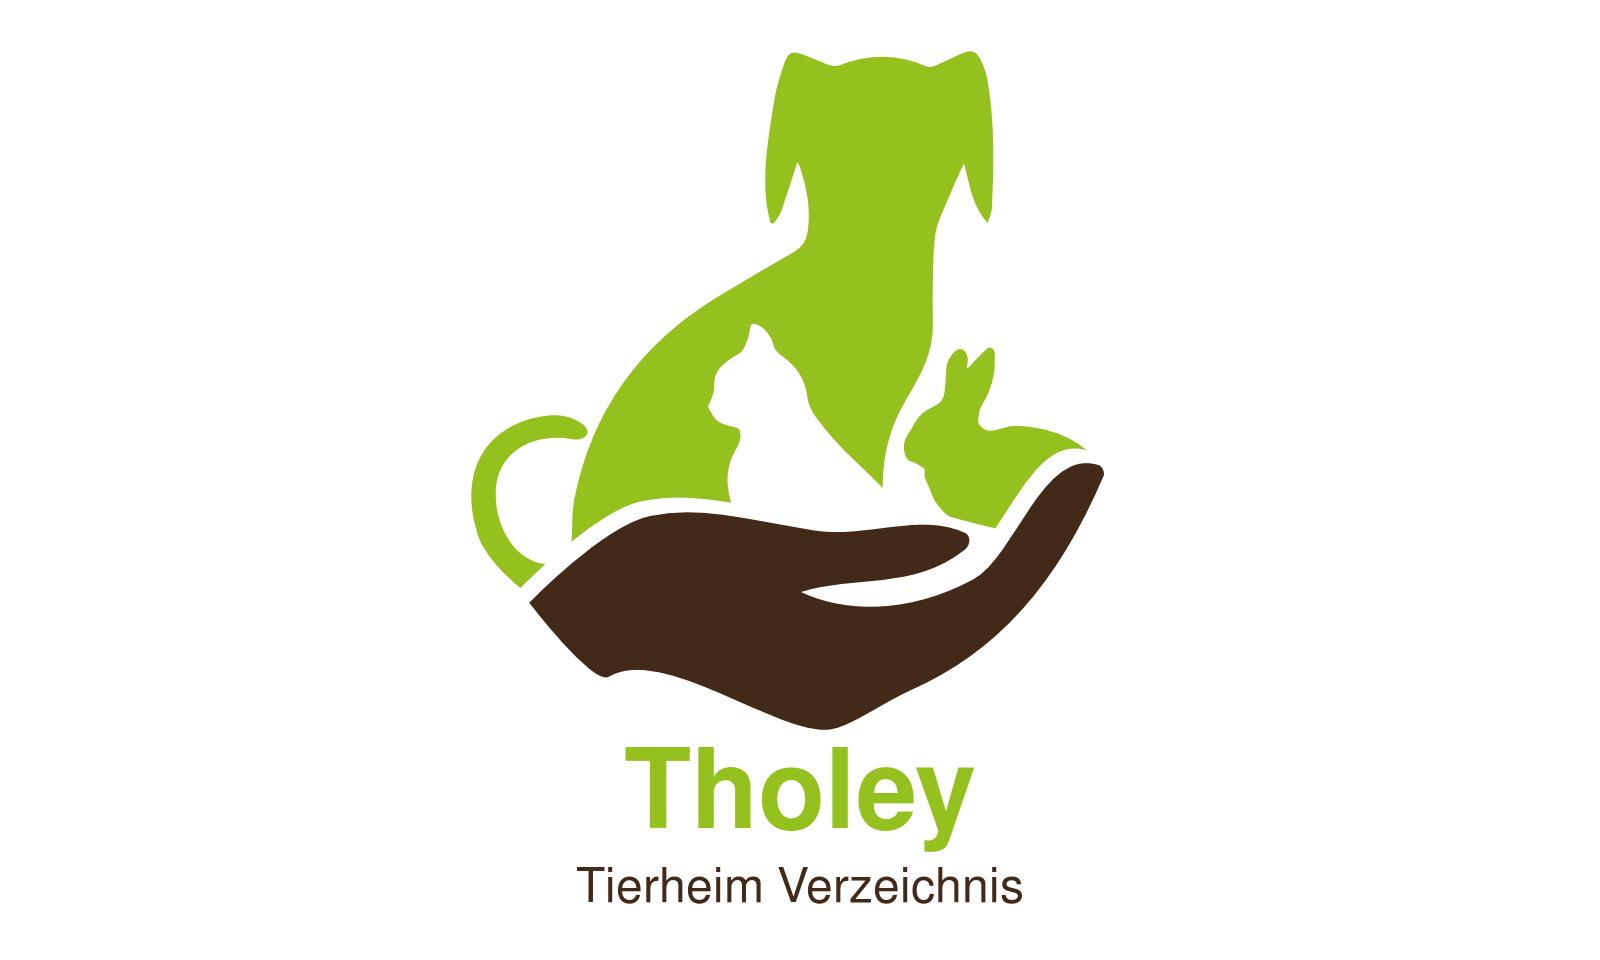 Tierheim Tholey